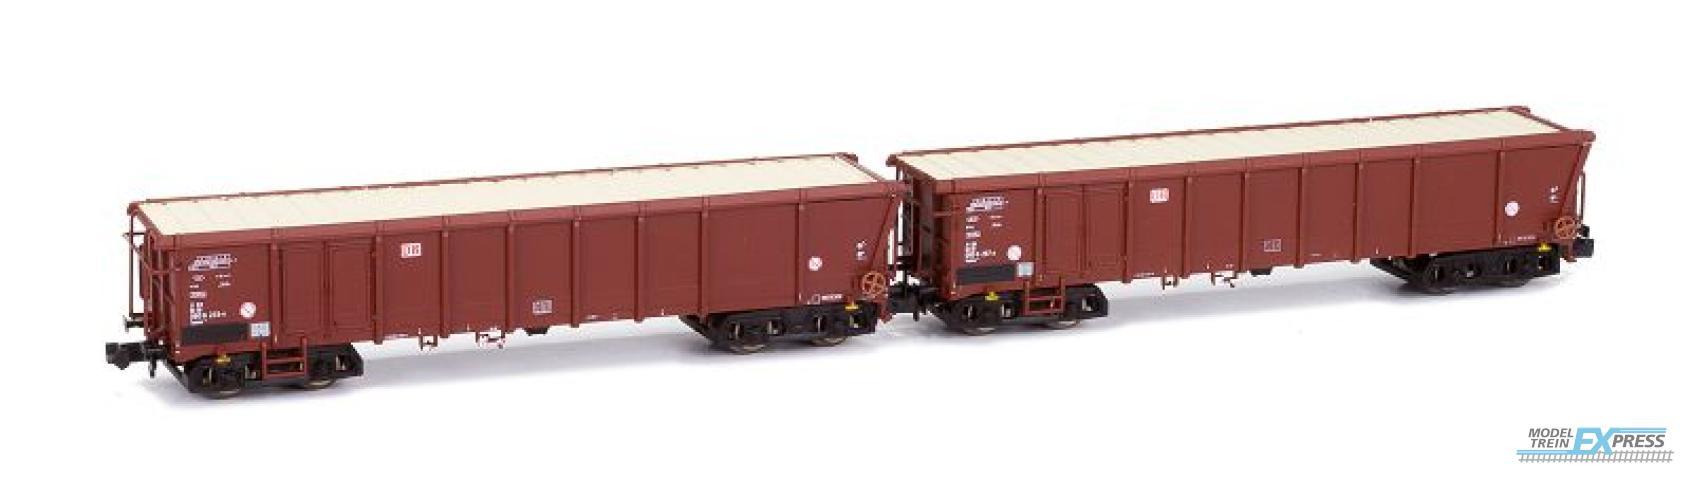 Hobbytrain 23411